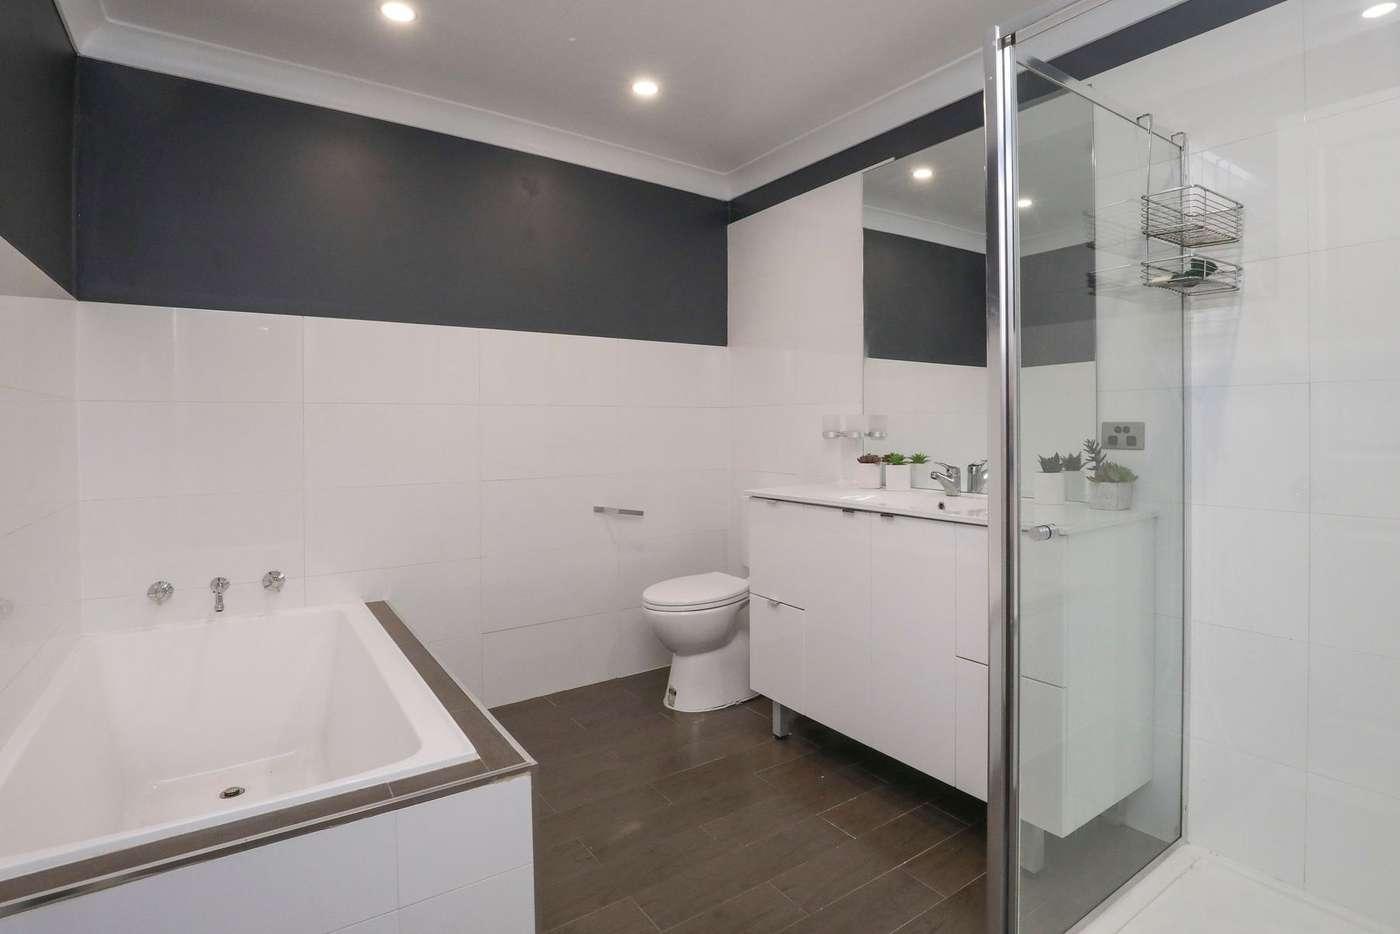 Sixth view of Homely house listing, 360 Eleventh Street, Mildura VIC 3500